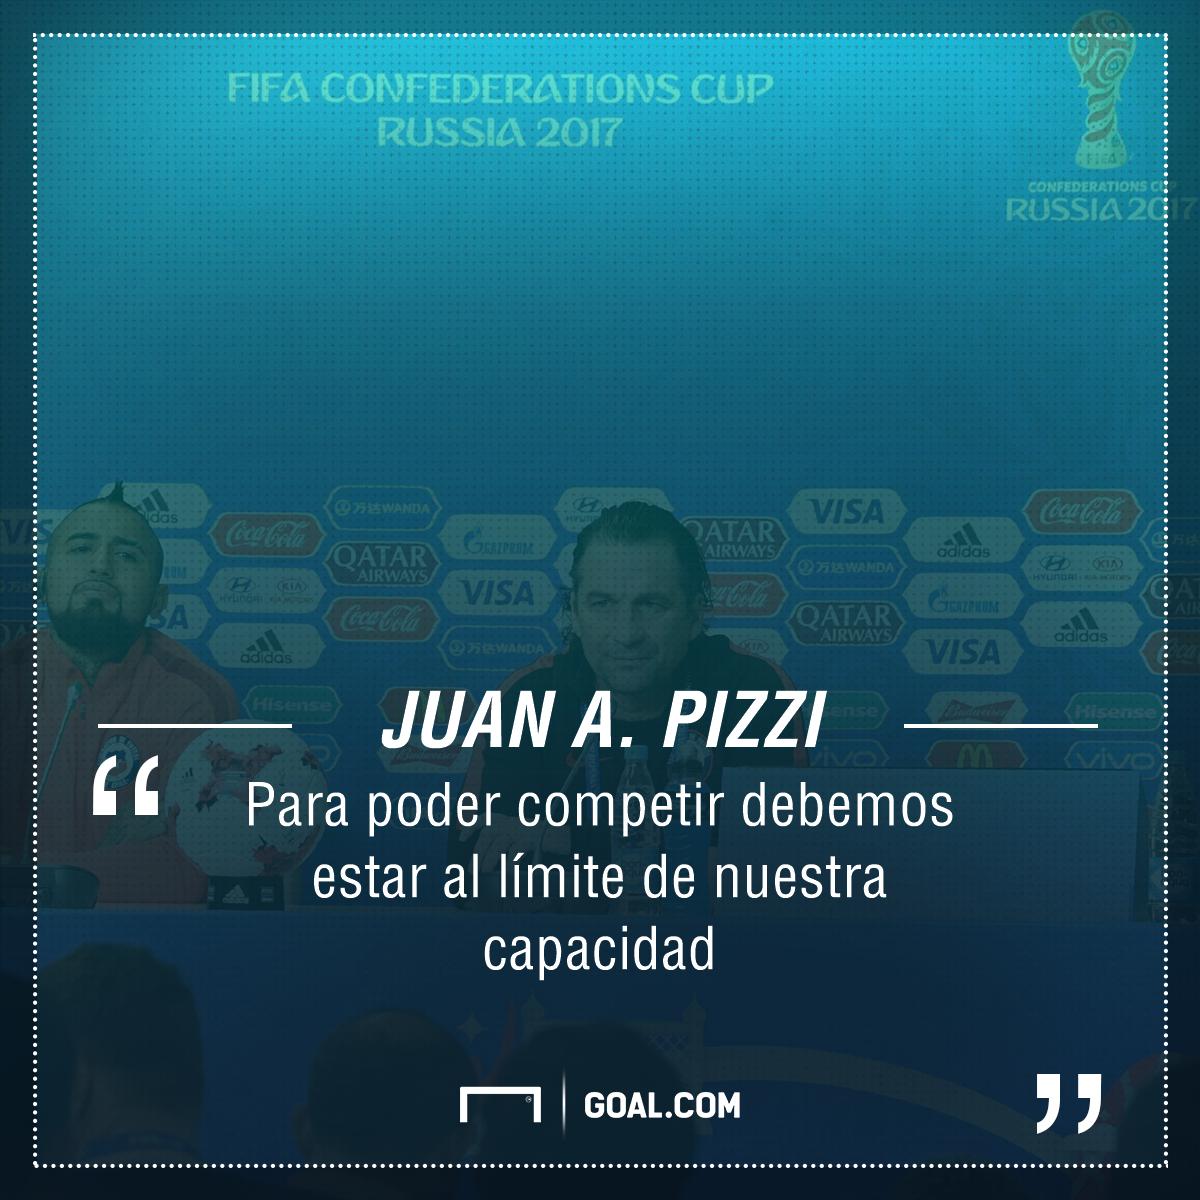 Juan Antonio Pizzi PS 010717